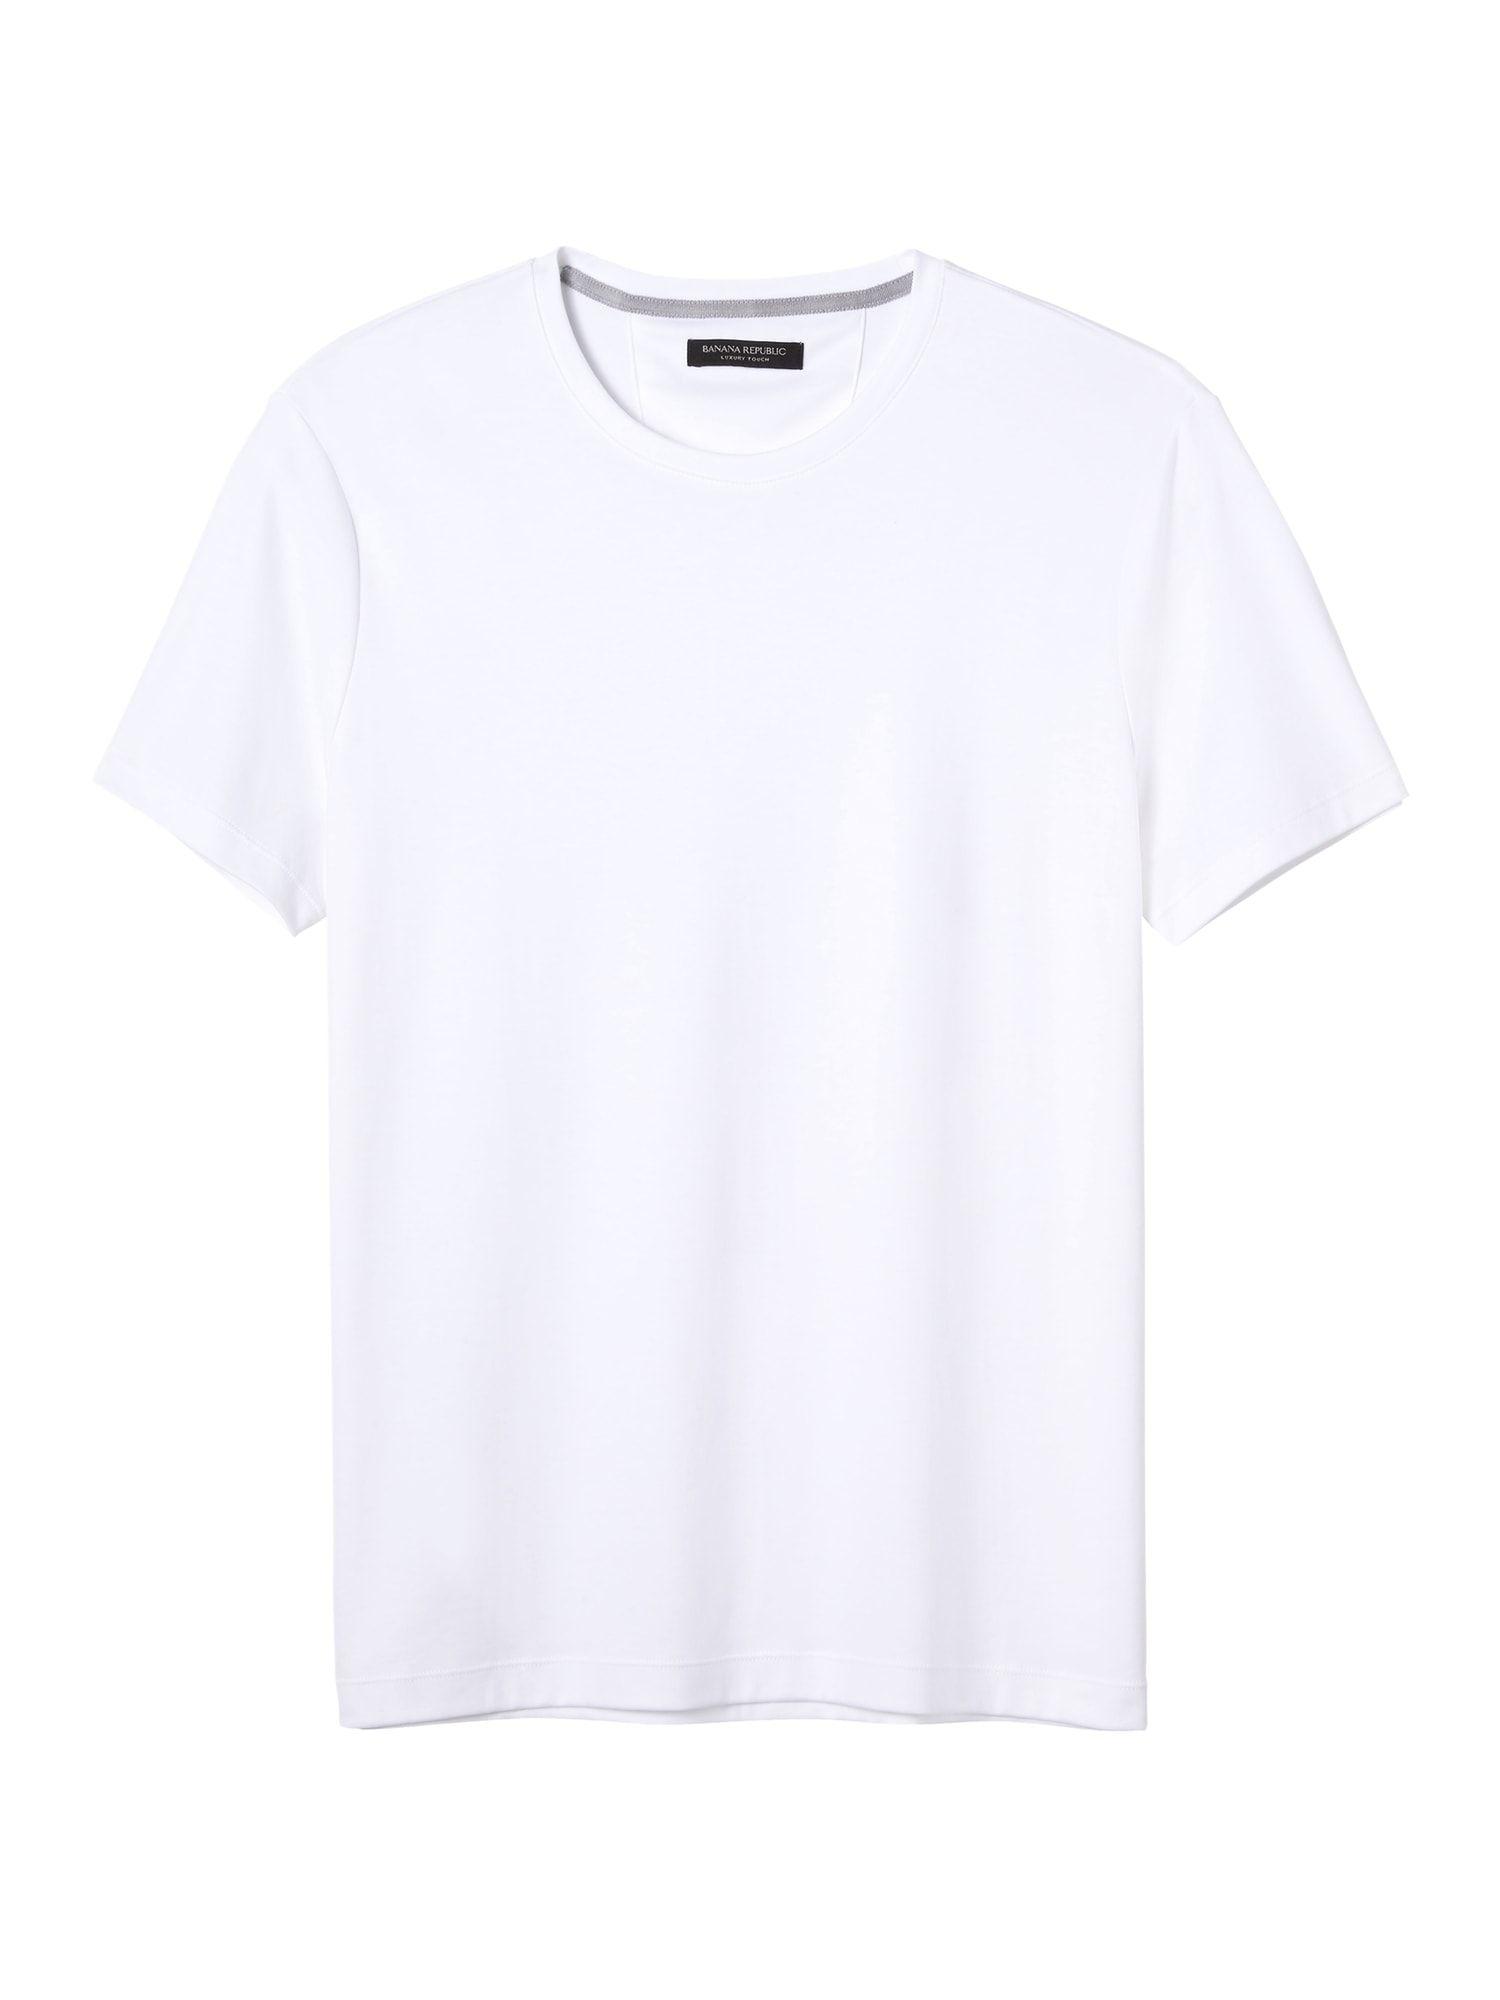 Performance Comfort 7 colors Stafford Long Sleeve Crew Neck Pocket T-Shirt